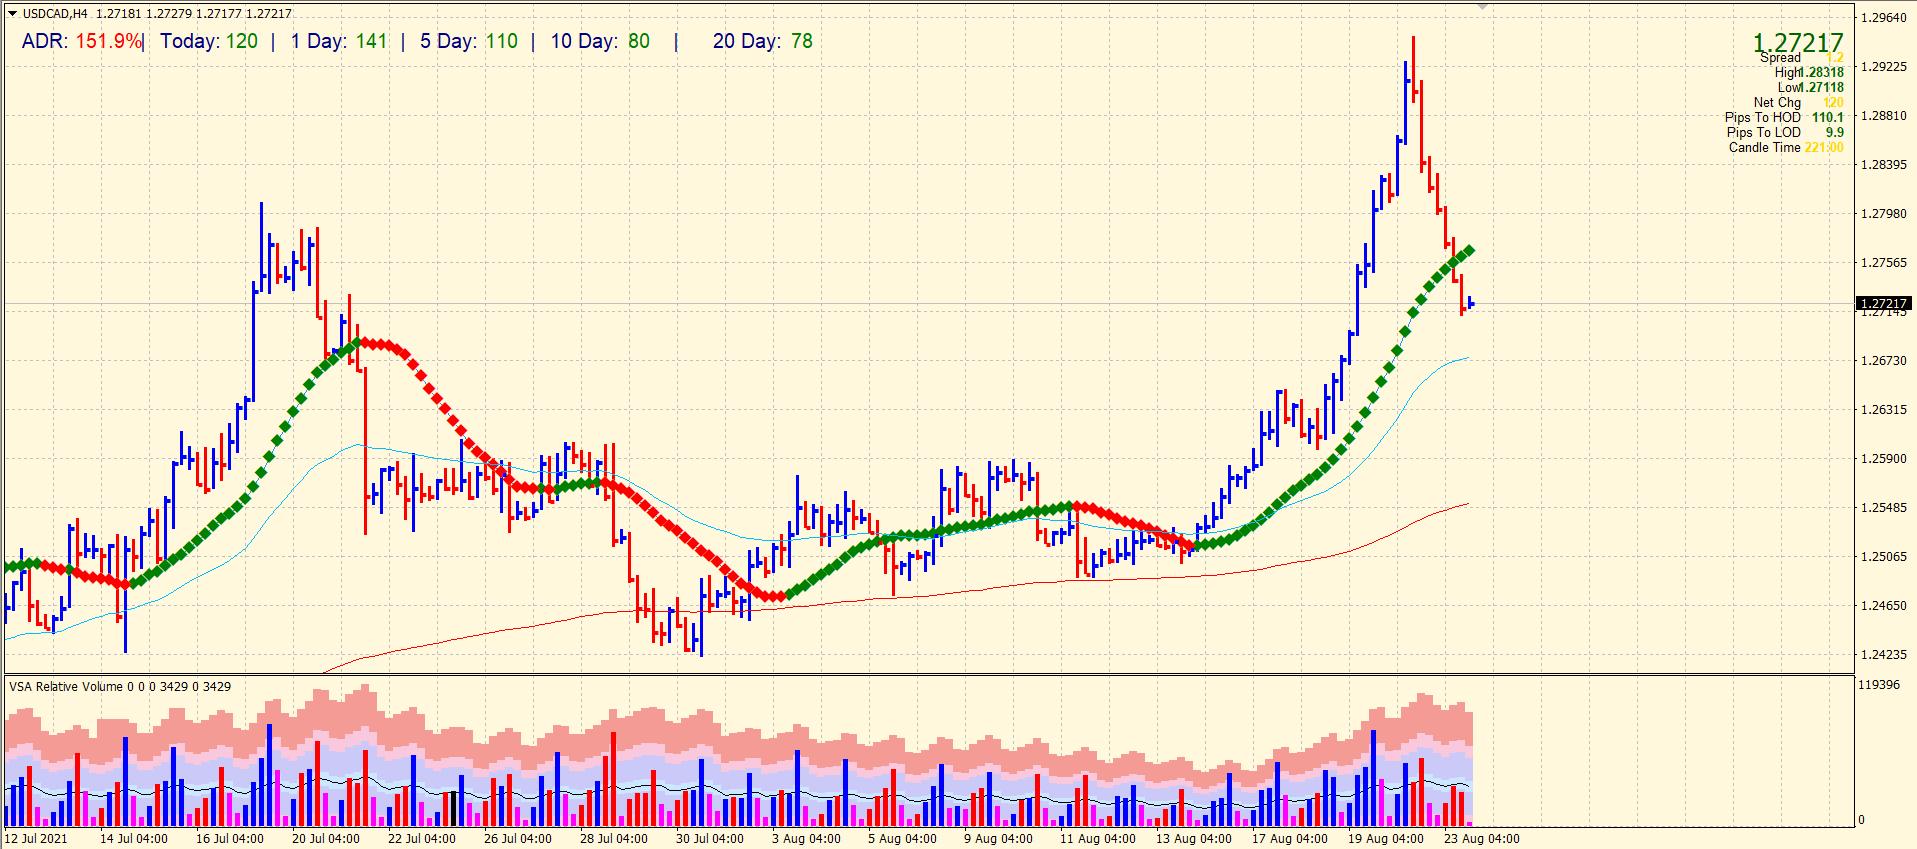 USD/CAD 4-hou price chart analysis